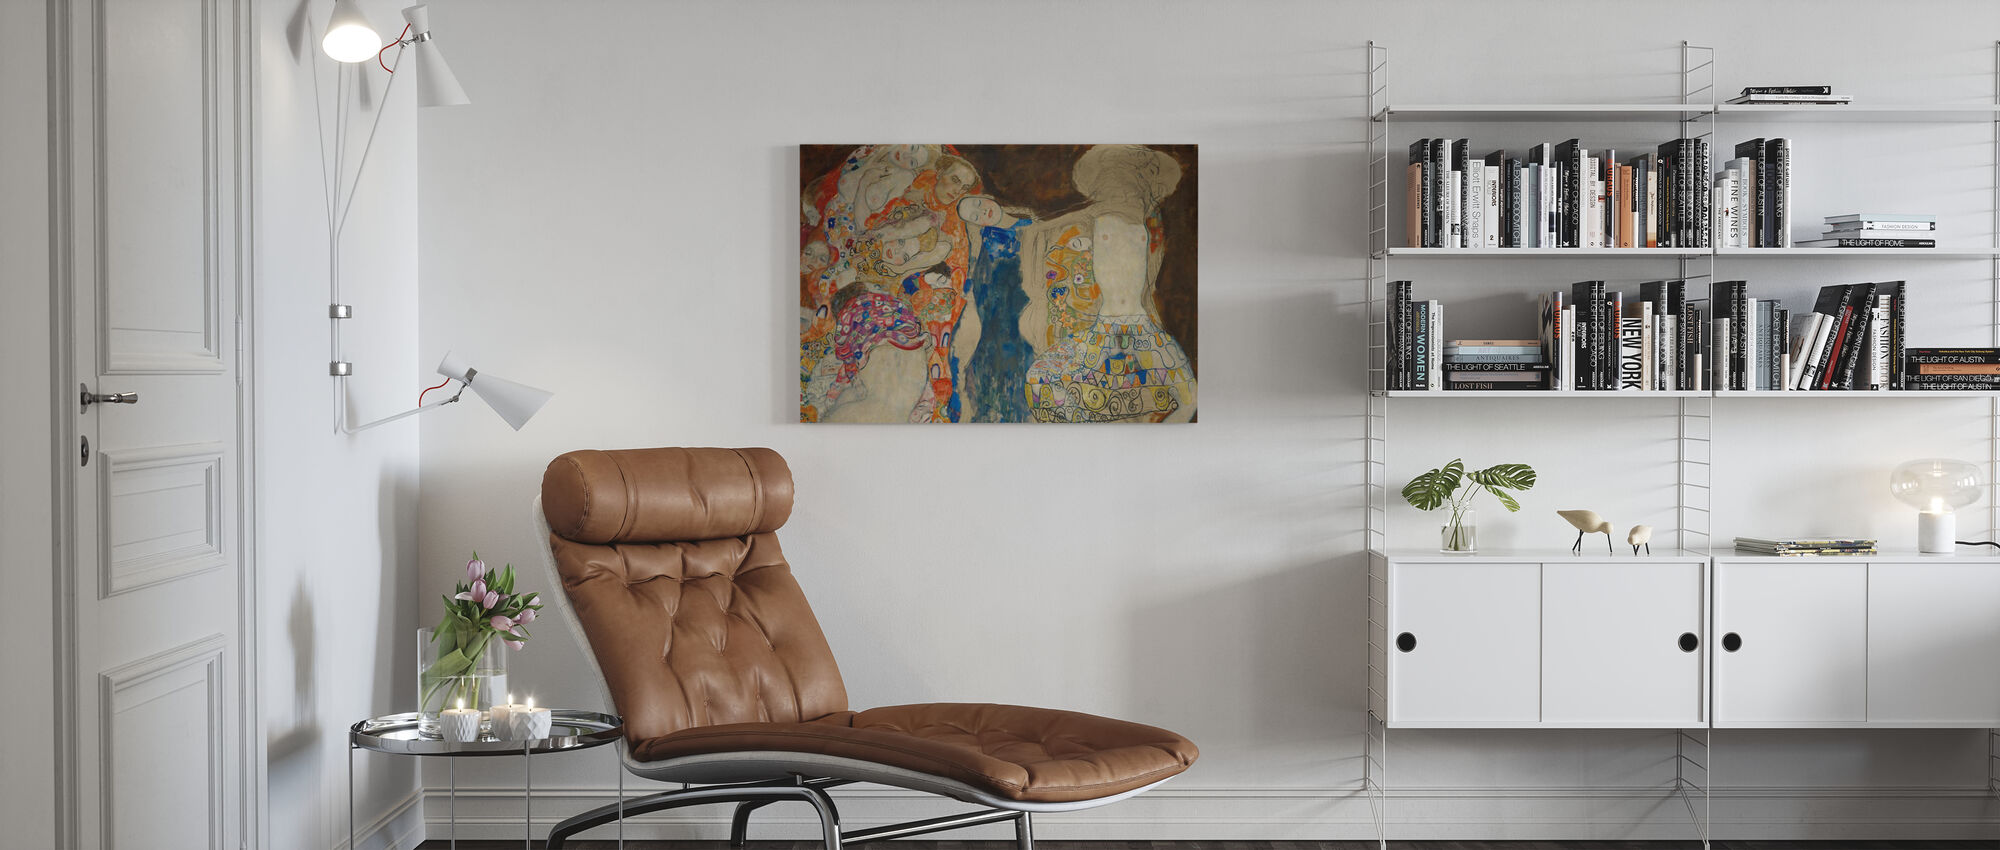 Brud - Gustav Klimt - Lerretsbilde - Stue